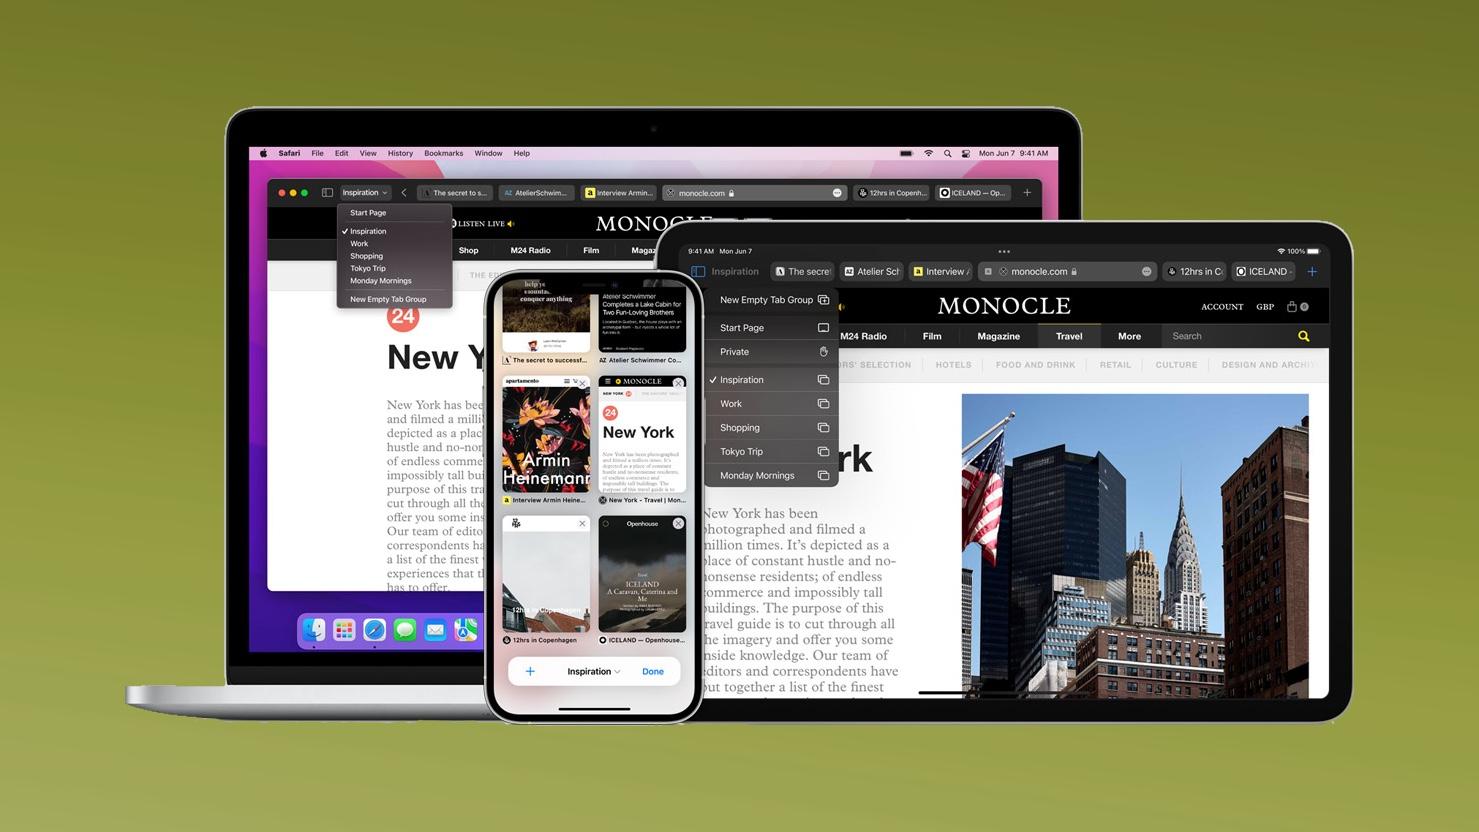 Safari in macos Montrey iOS 15